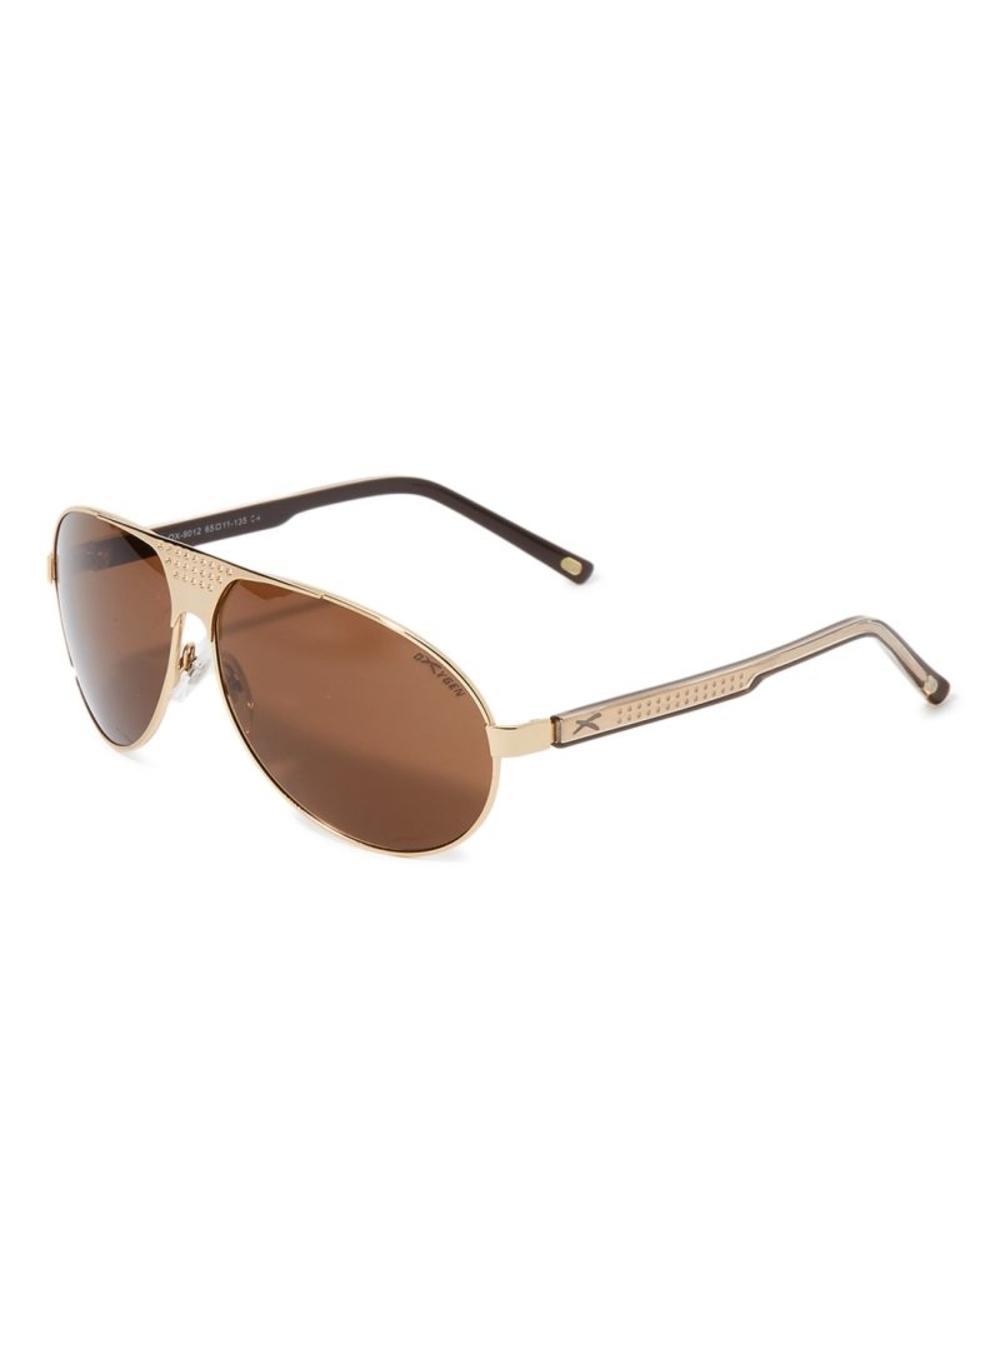 OXYGEN Unisex Aviator Shape UV Protection Sunglasses OX9012-C4